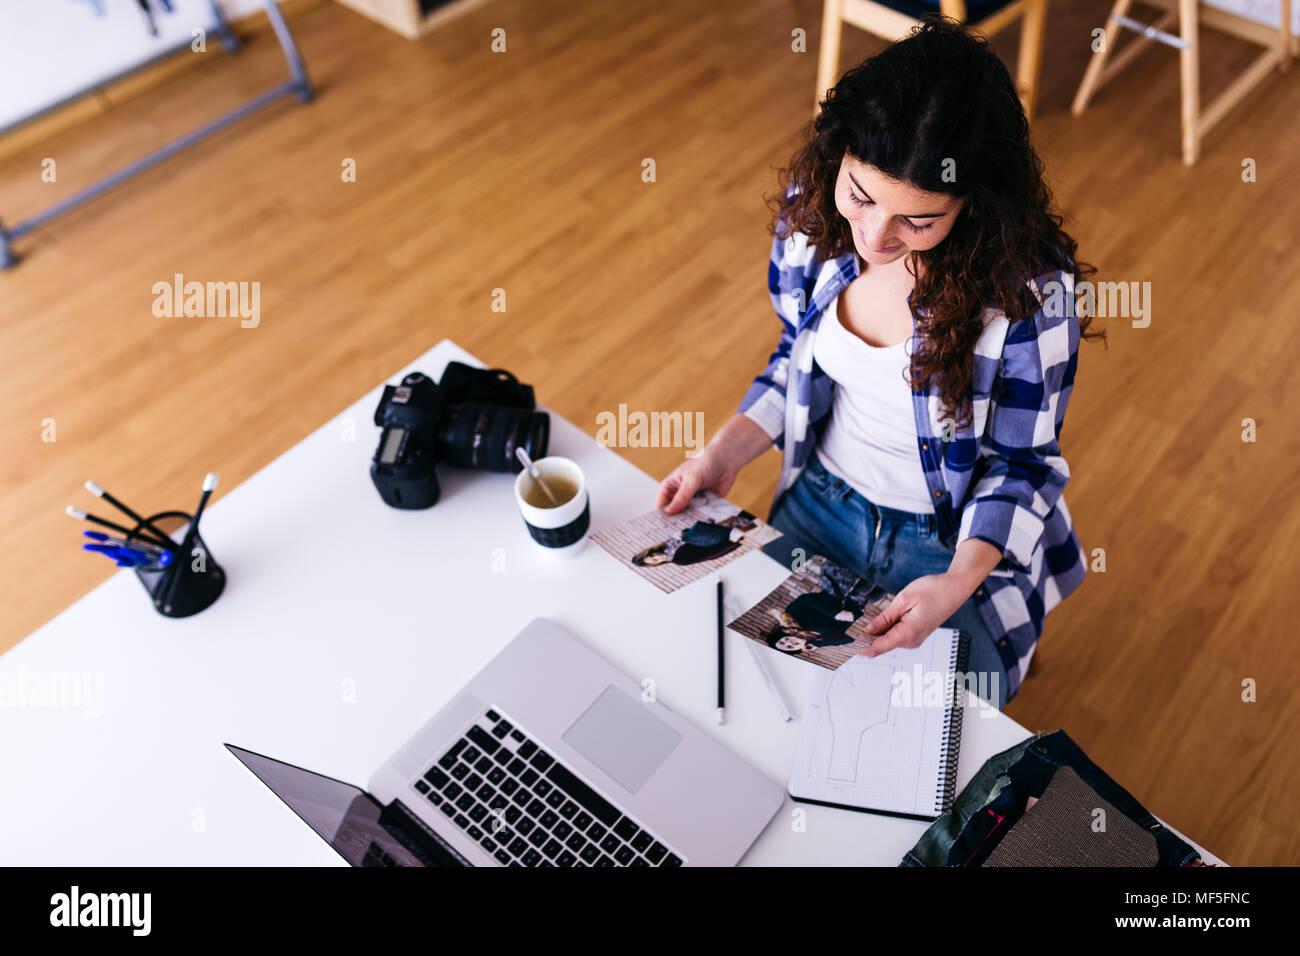 Mode avec laptop looking at in studio Photo Stock